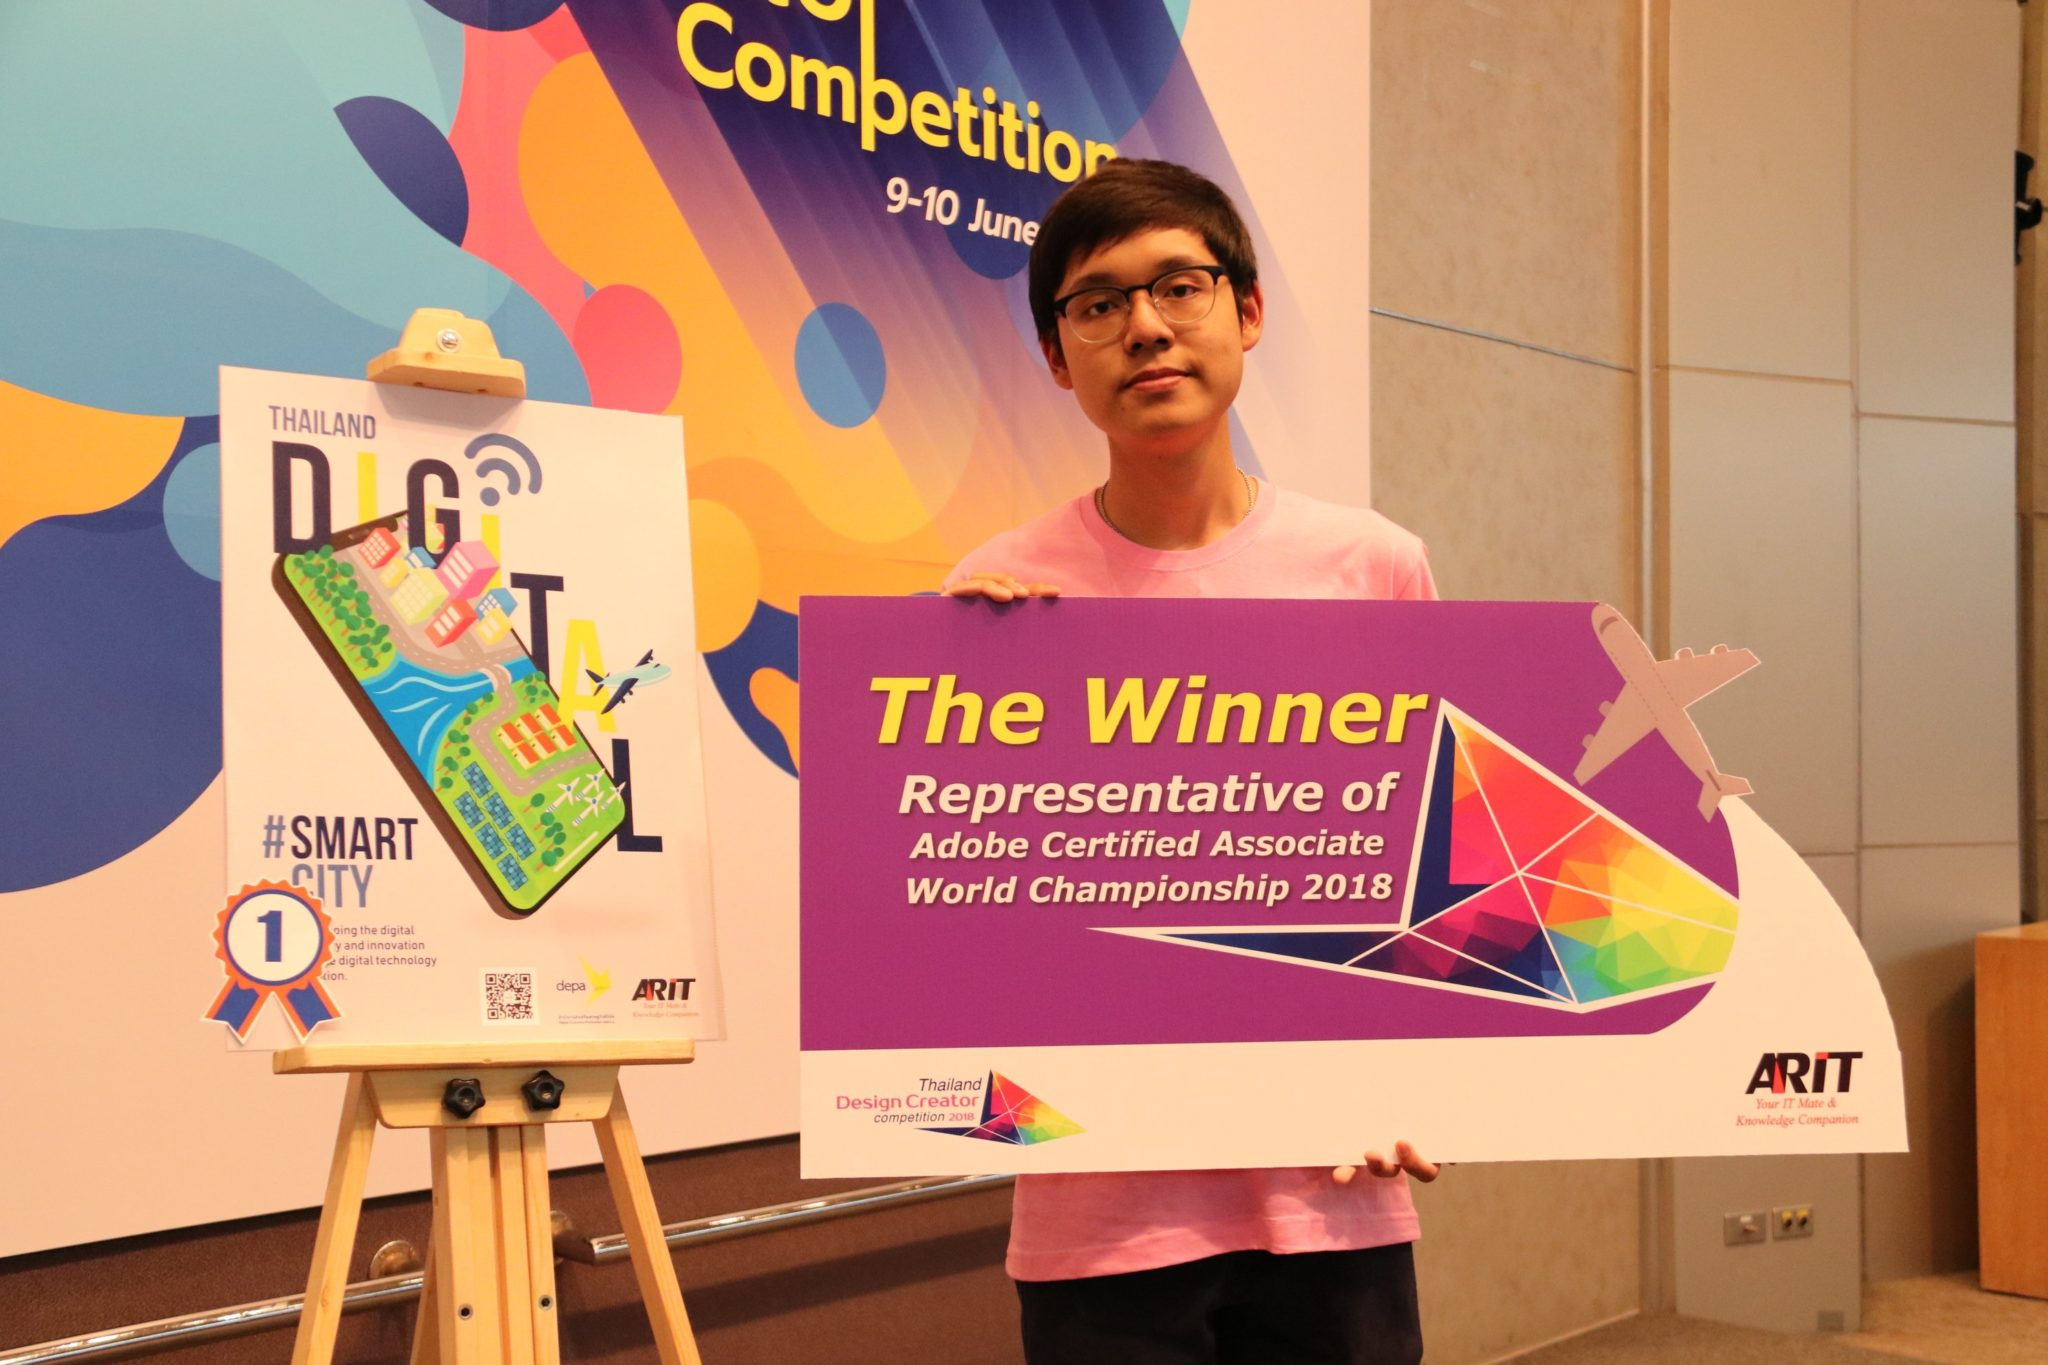 ARIT แสดงความยินดีกับ เยาวชนไทยคว้าแชมป์เวที Thailand Design Creator Competition 2018 2 -